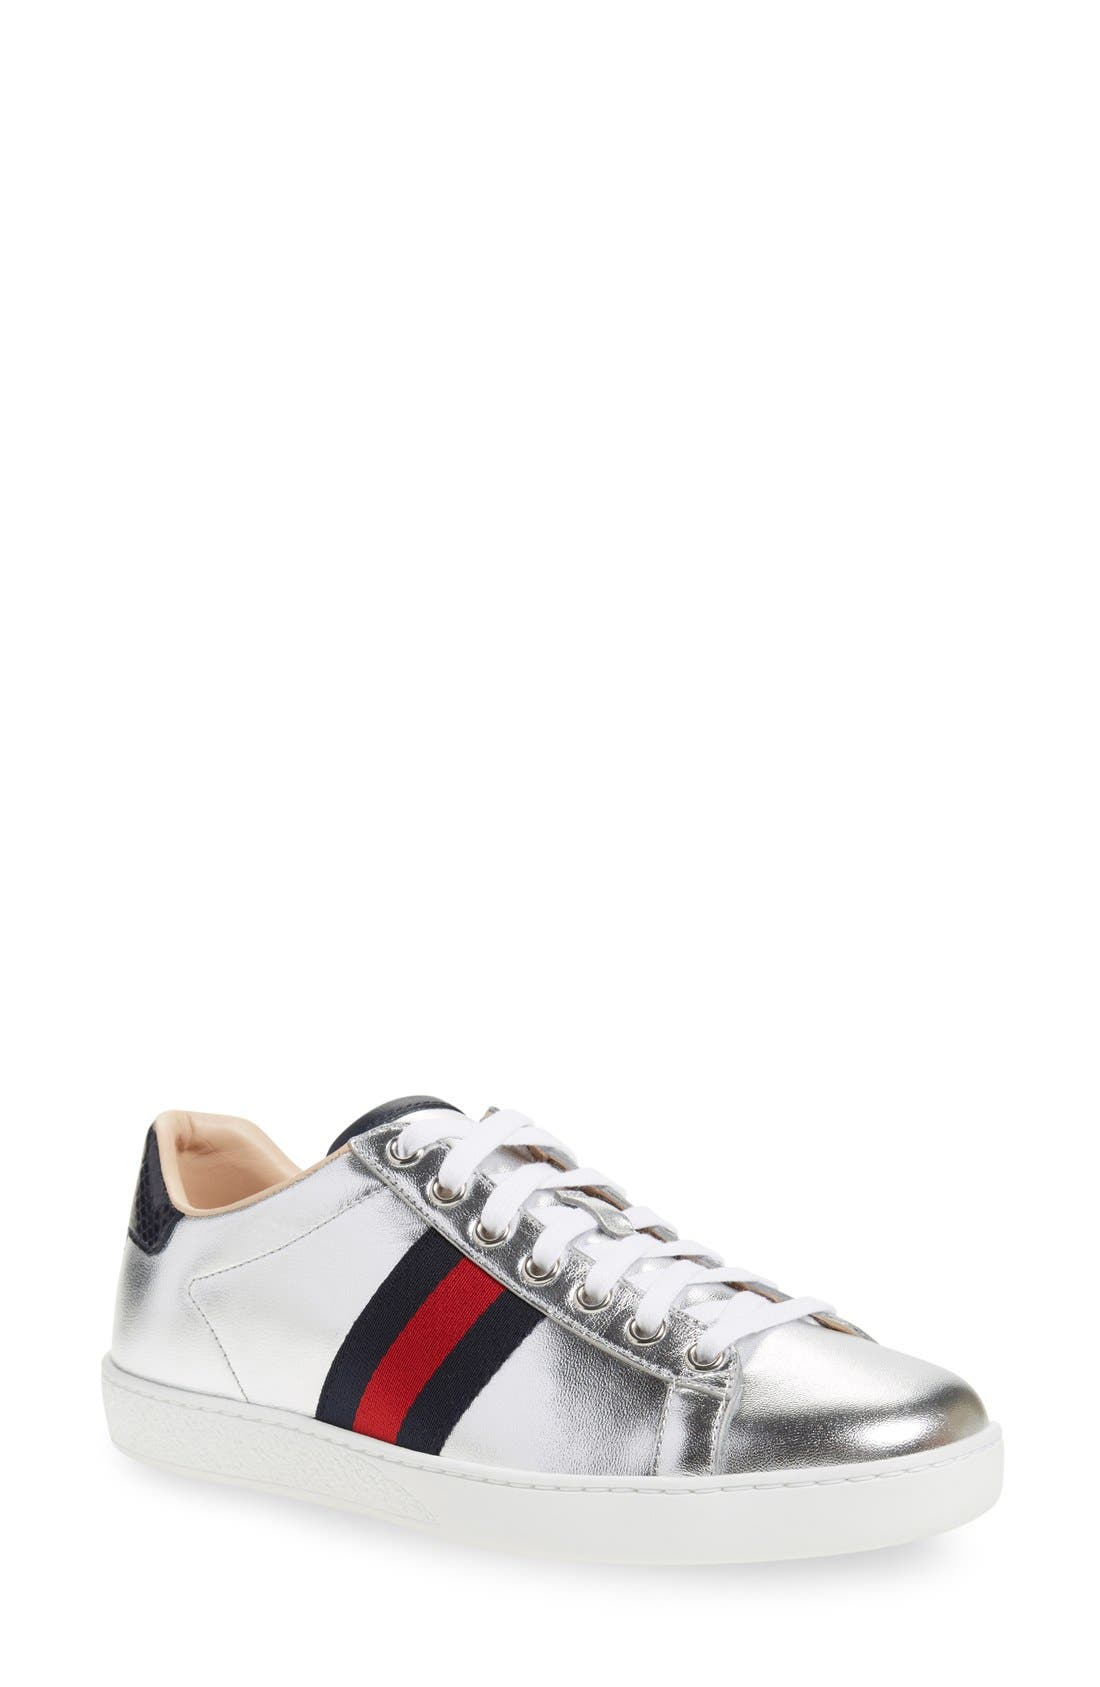 Main Image - Gucci 'New Ace' Metallic Low Top Sneaker (Women)